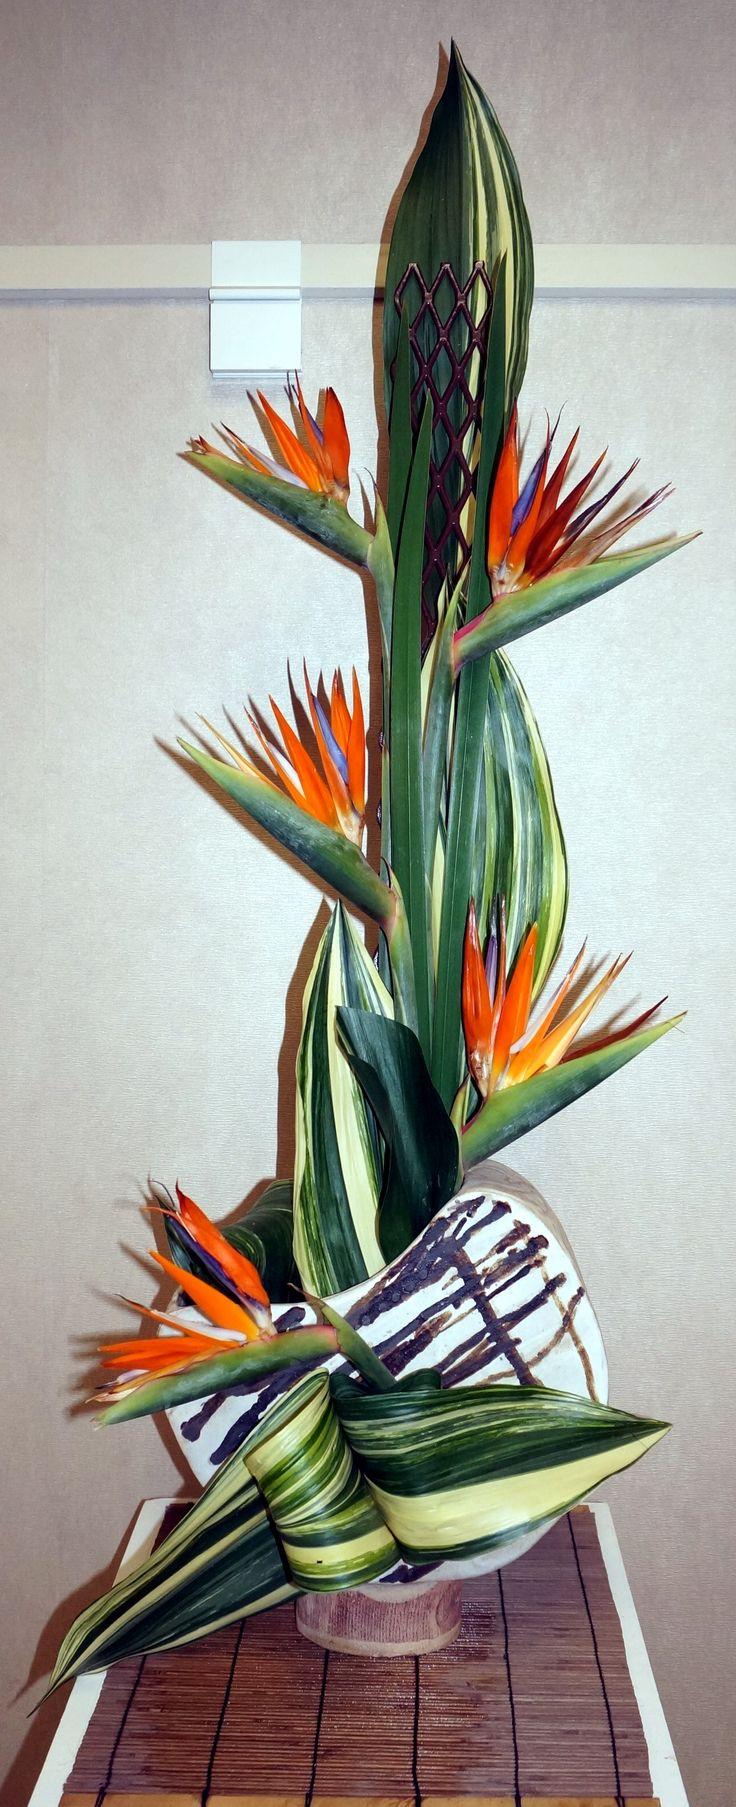 886 Best Flower Arrangements Images On Pinterest Floral